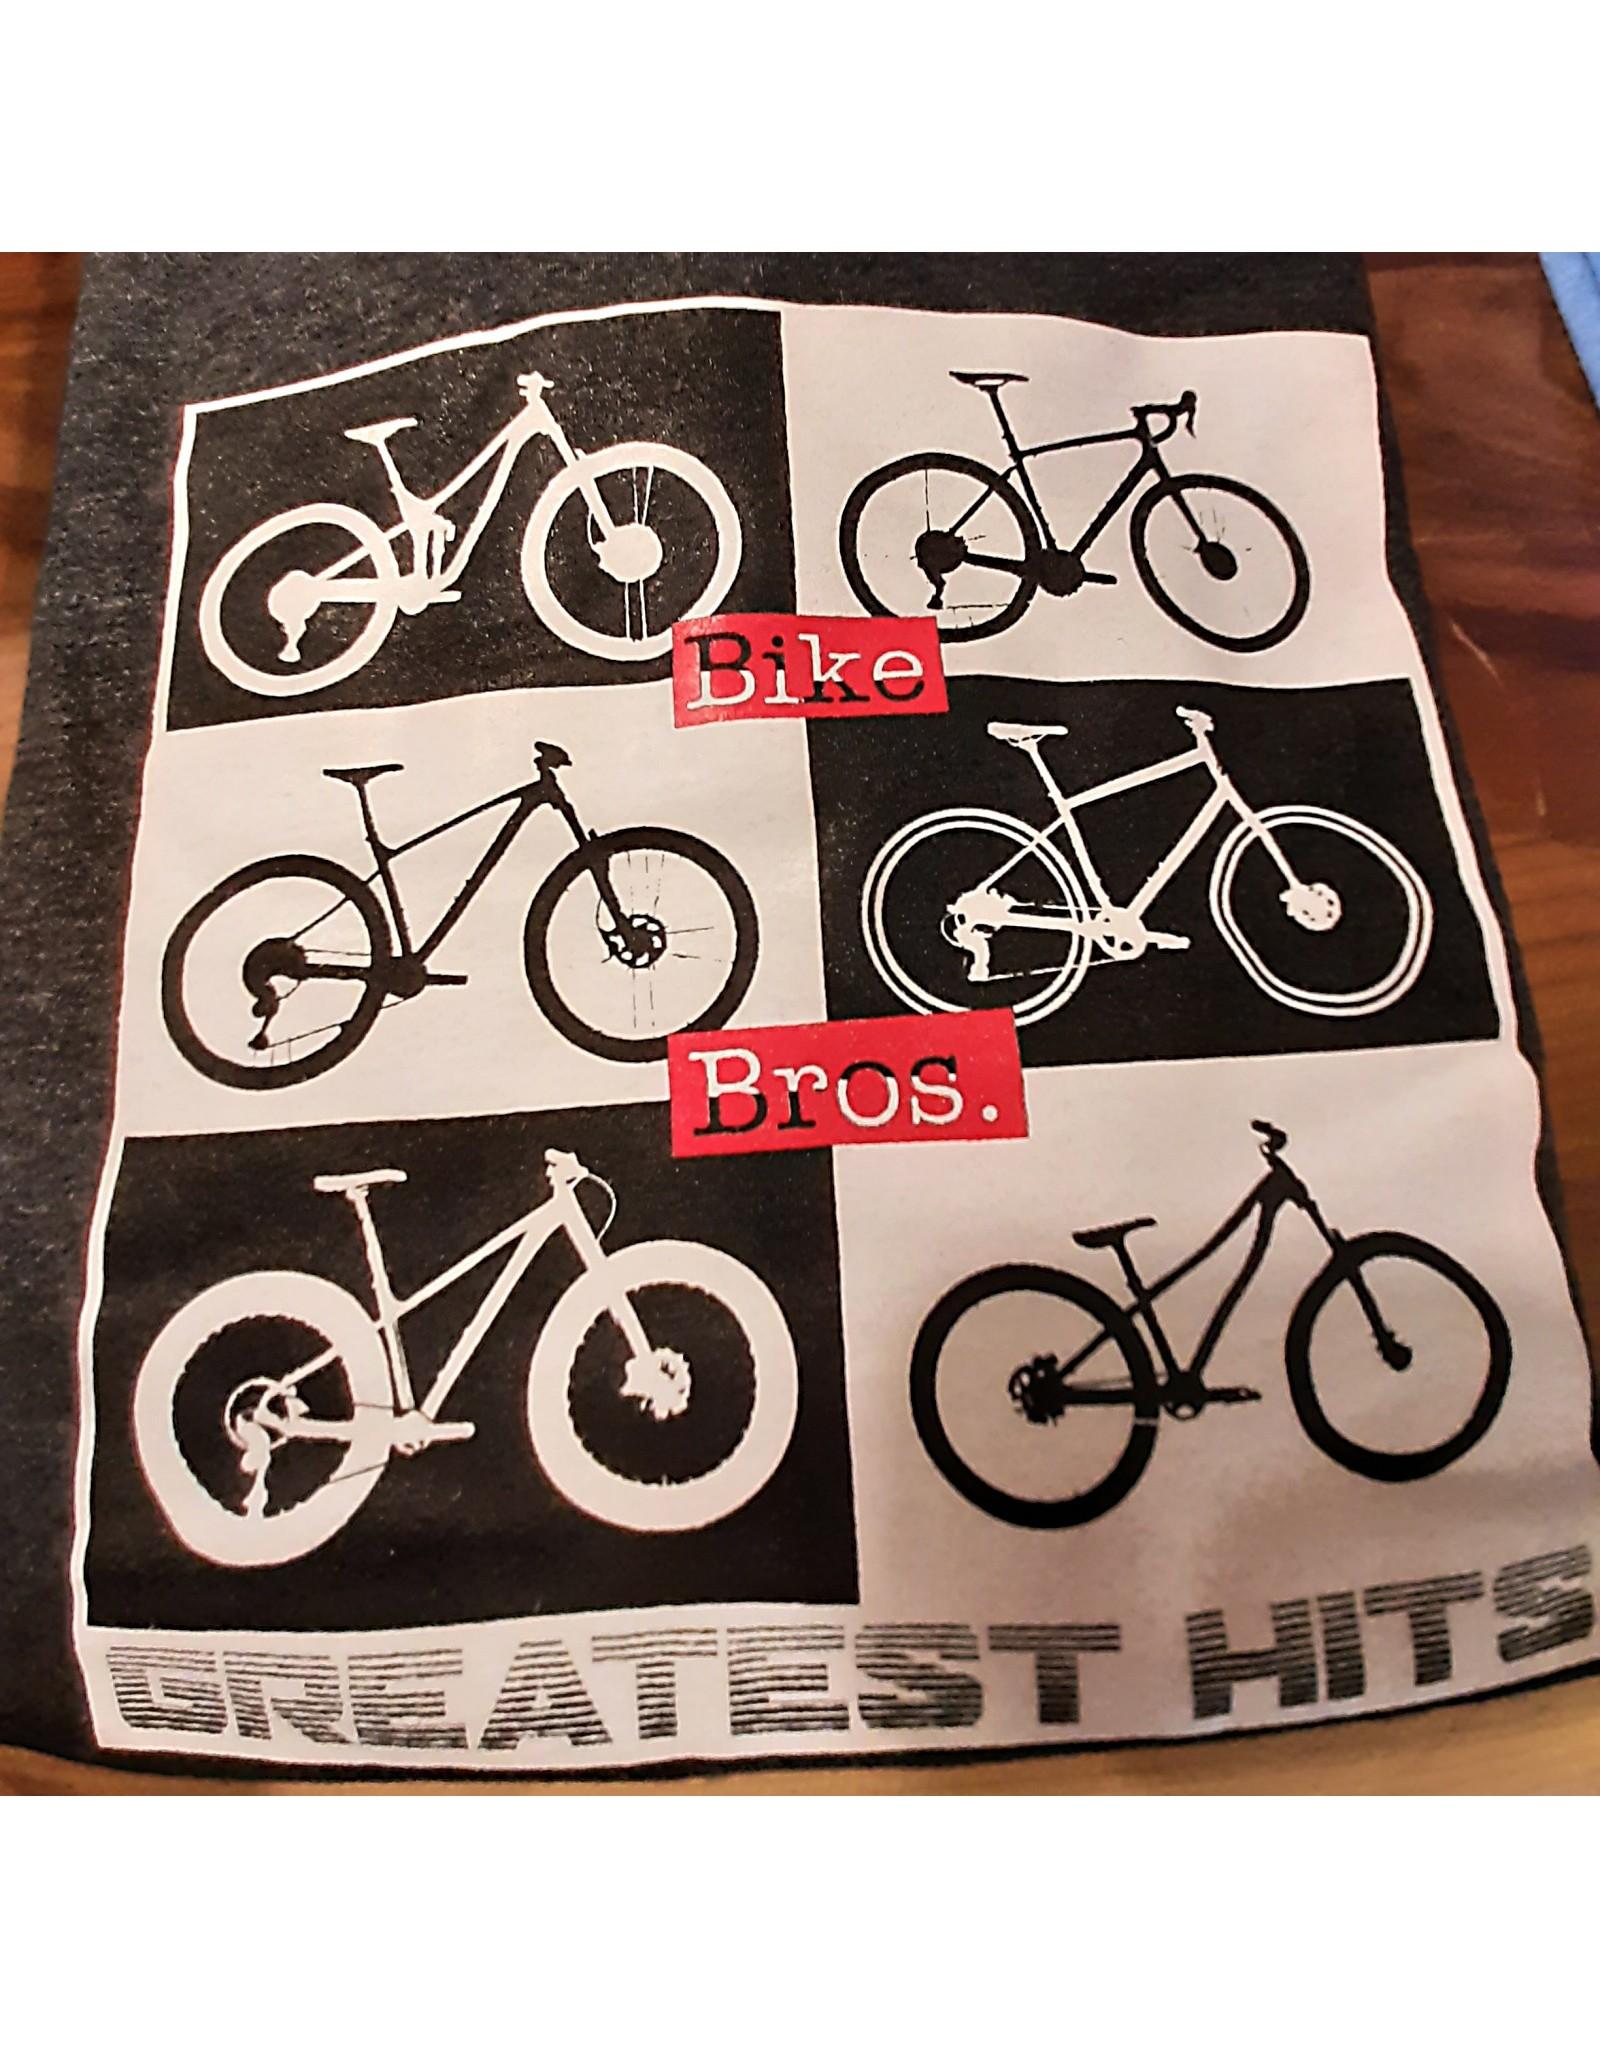 Bike Bros. Greatest Hits - Bike Bros T Shirt